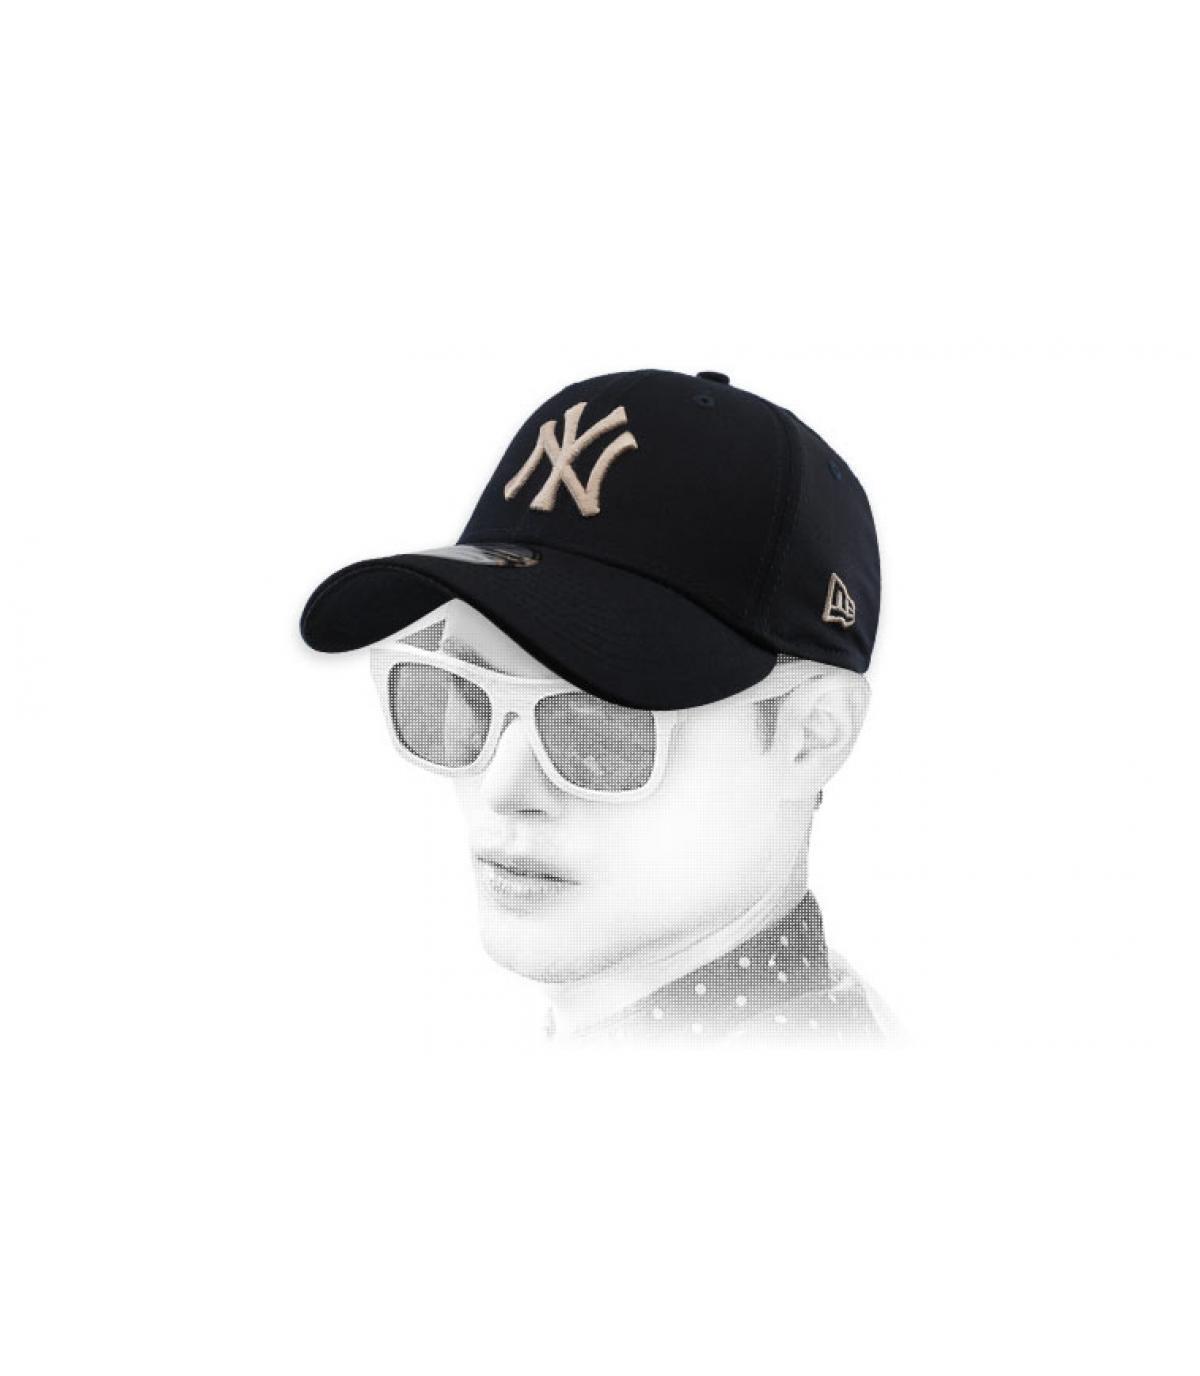 gorra NY negro stretch